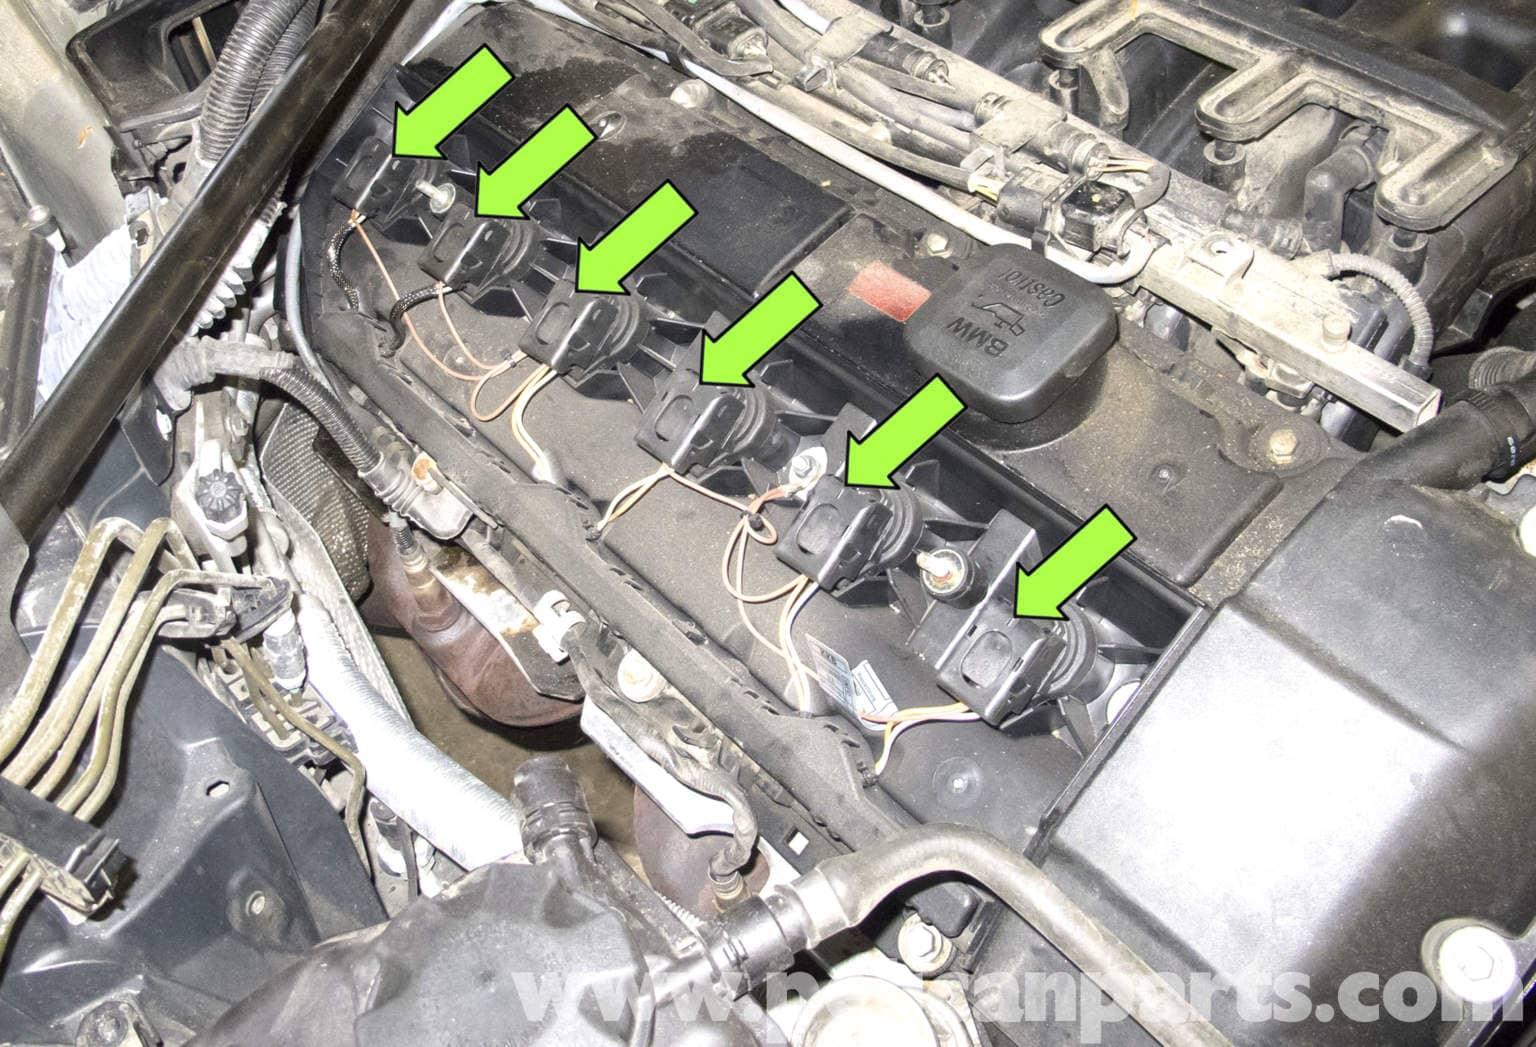 Fordfusionenginediagram Fotos Parts Diagrams Ford Fusion 2006